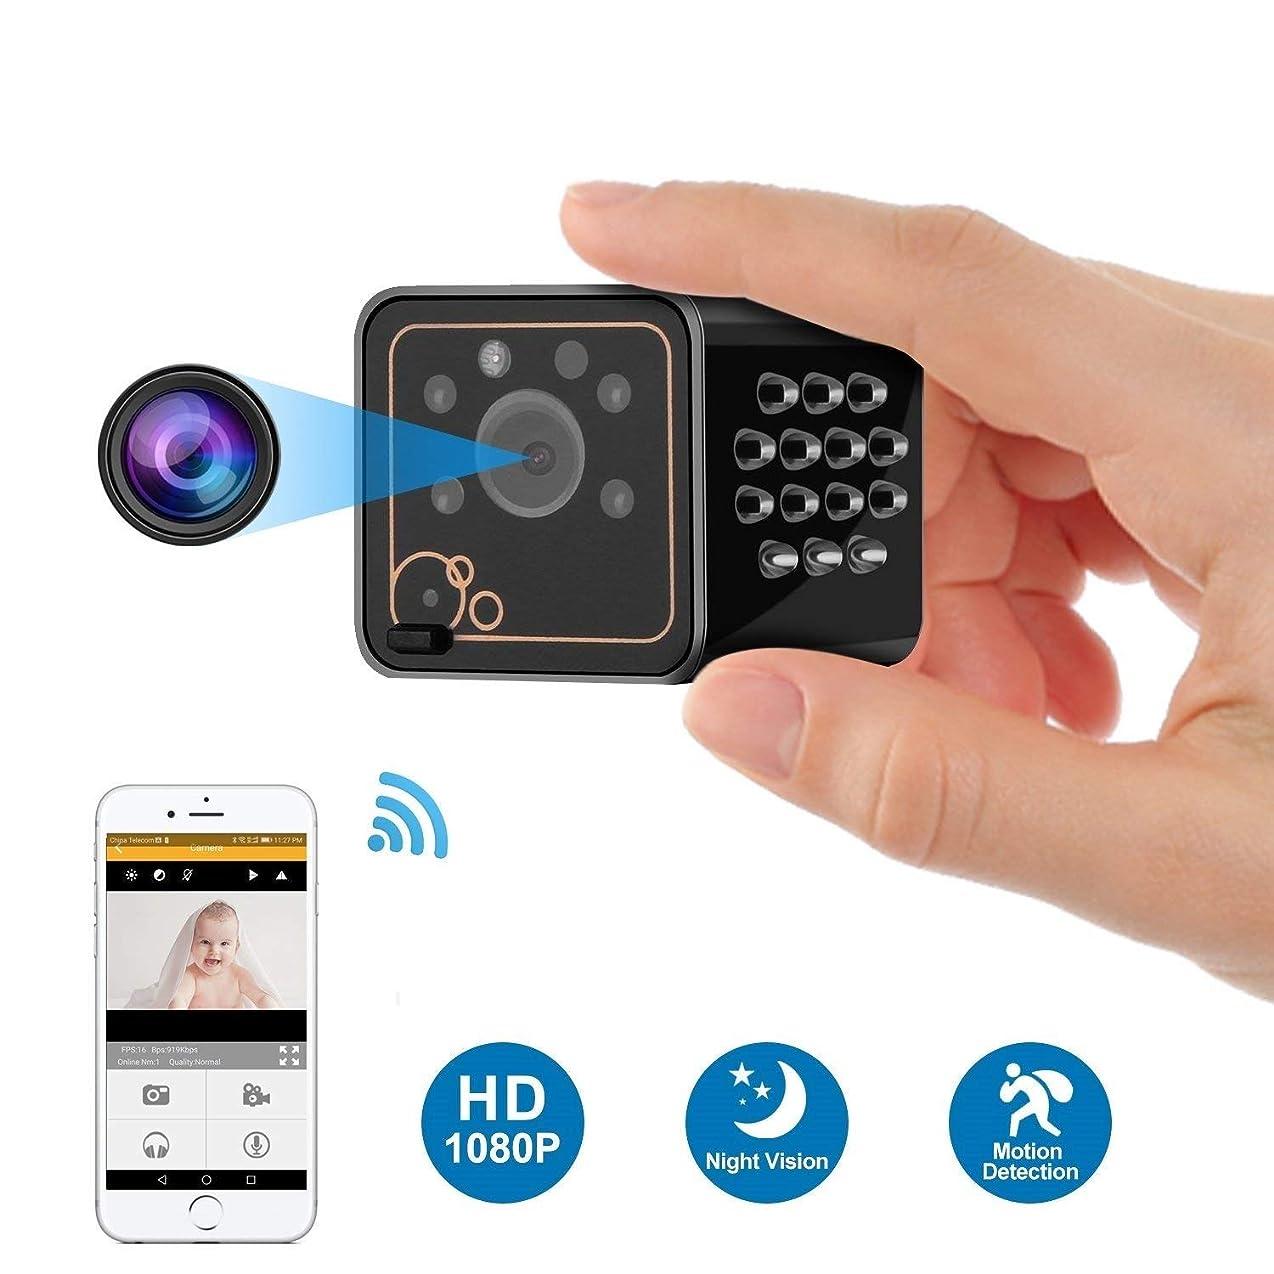 MYXMY Spy Camera Wireless Hidden Camera, Latest 1080P Hidden Camera Video Recorder, WiFi Nanny Cam with Night Vision, IP Security Camera for Home Security Monitoring (Color : No Memory Card) dkbktgmvkzbu8301